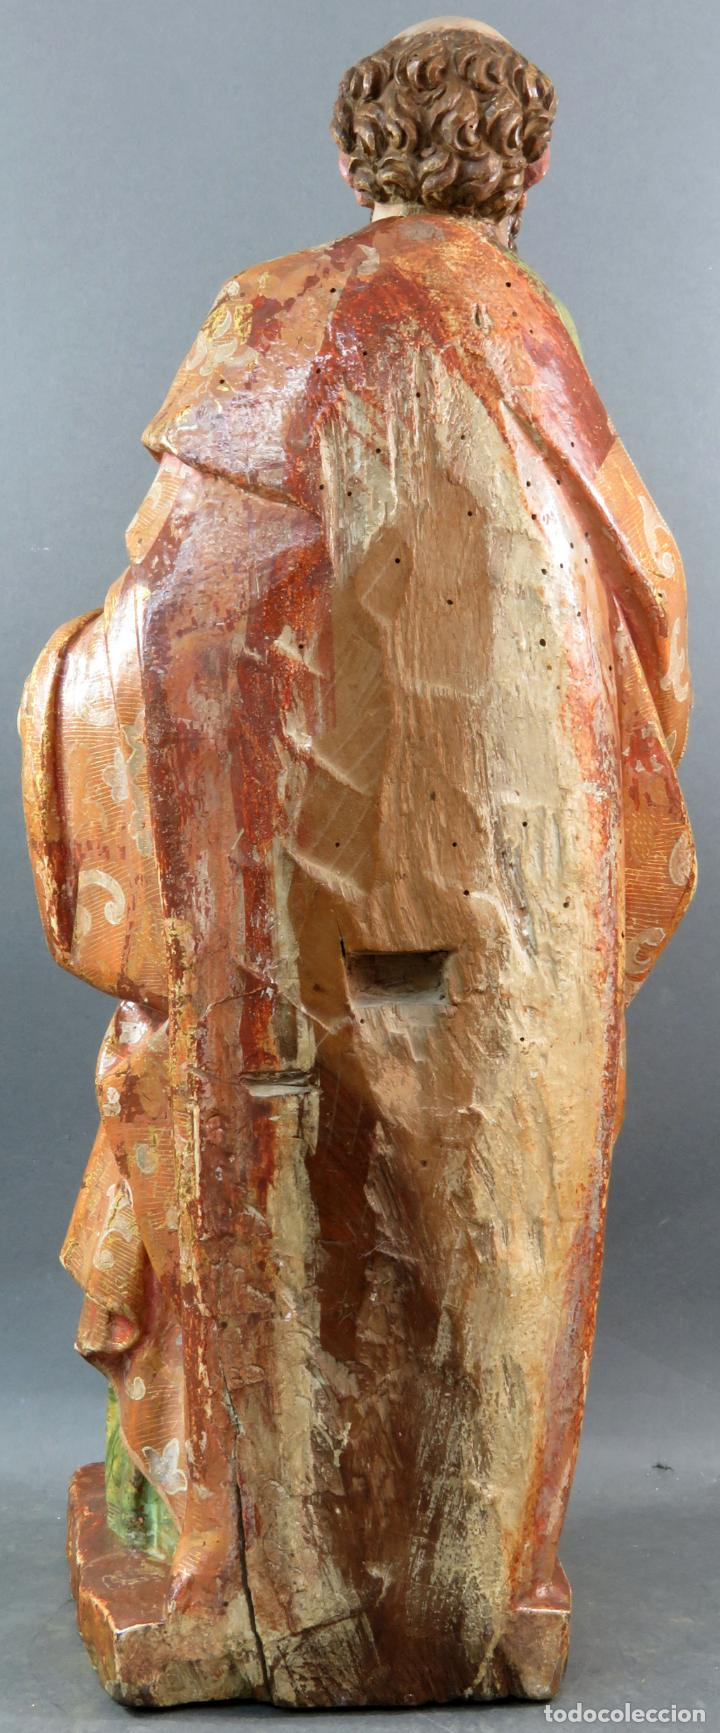 Arte: Talla San Pablo en madera estofada dorada policromada seguidor Gregorio Fernández siglo XVI - Foto 9 - 159655670